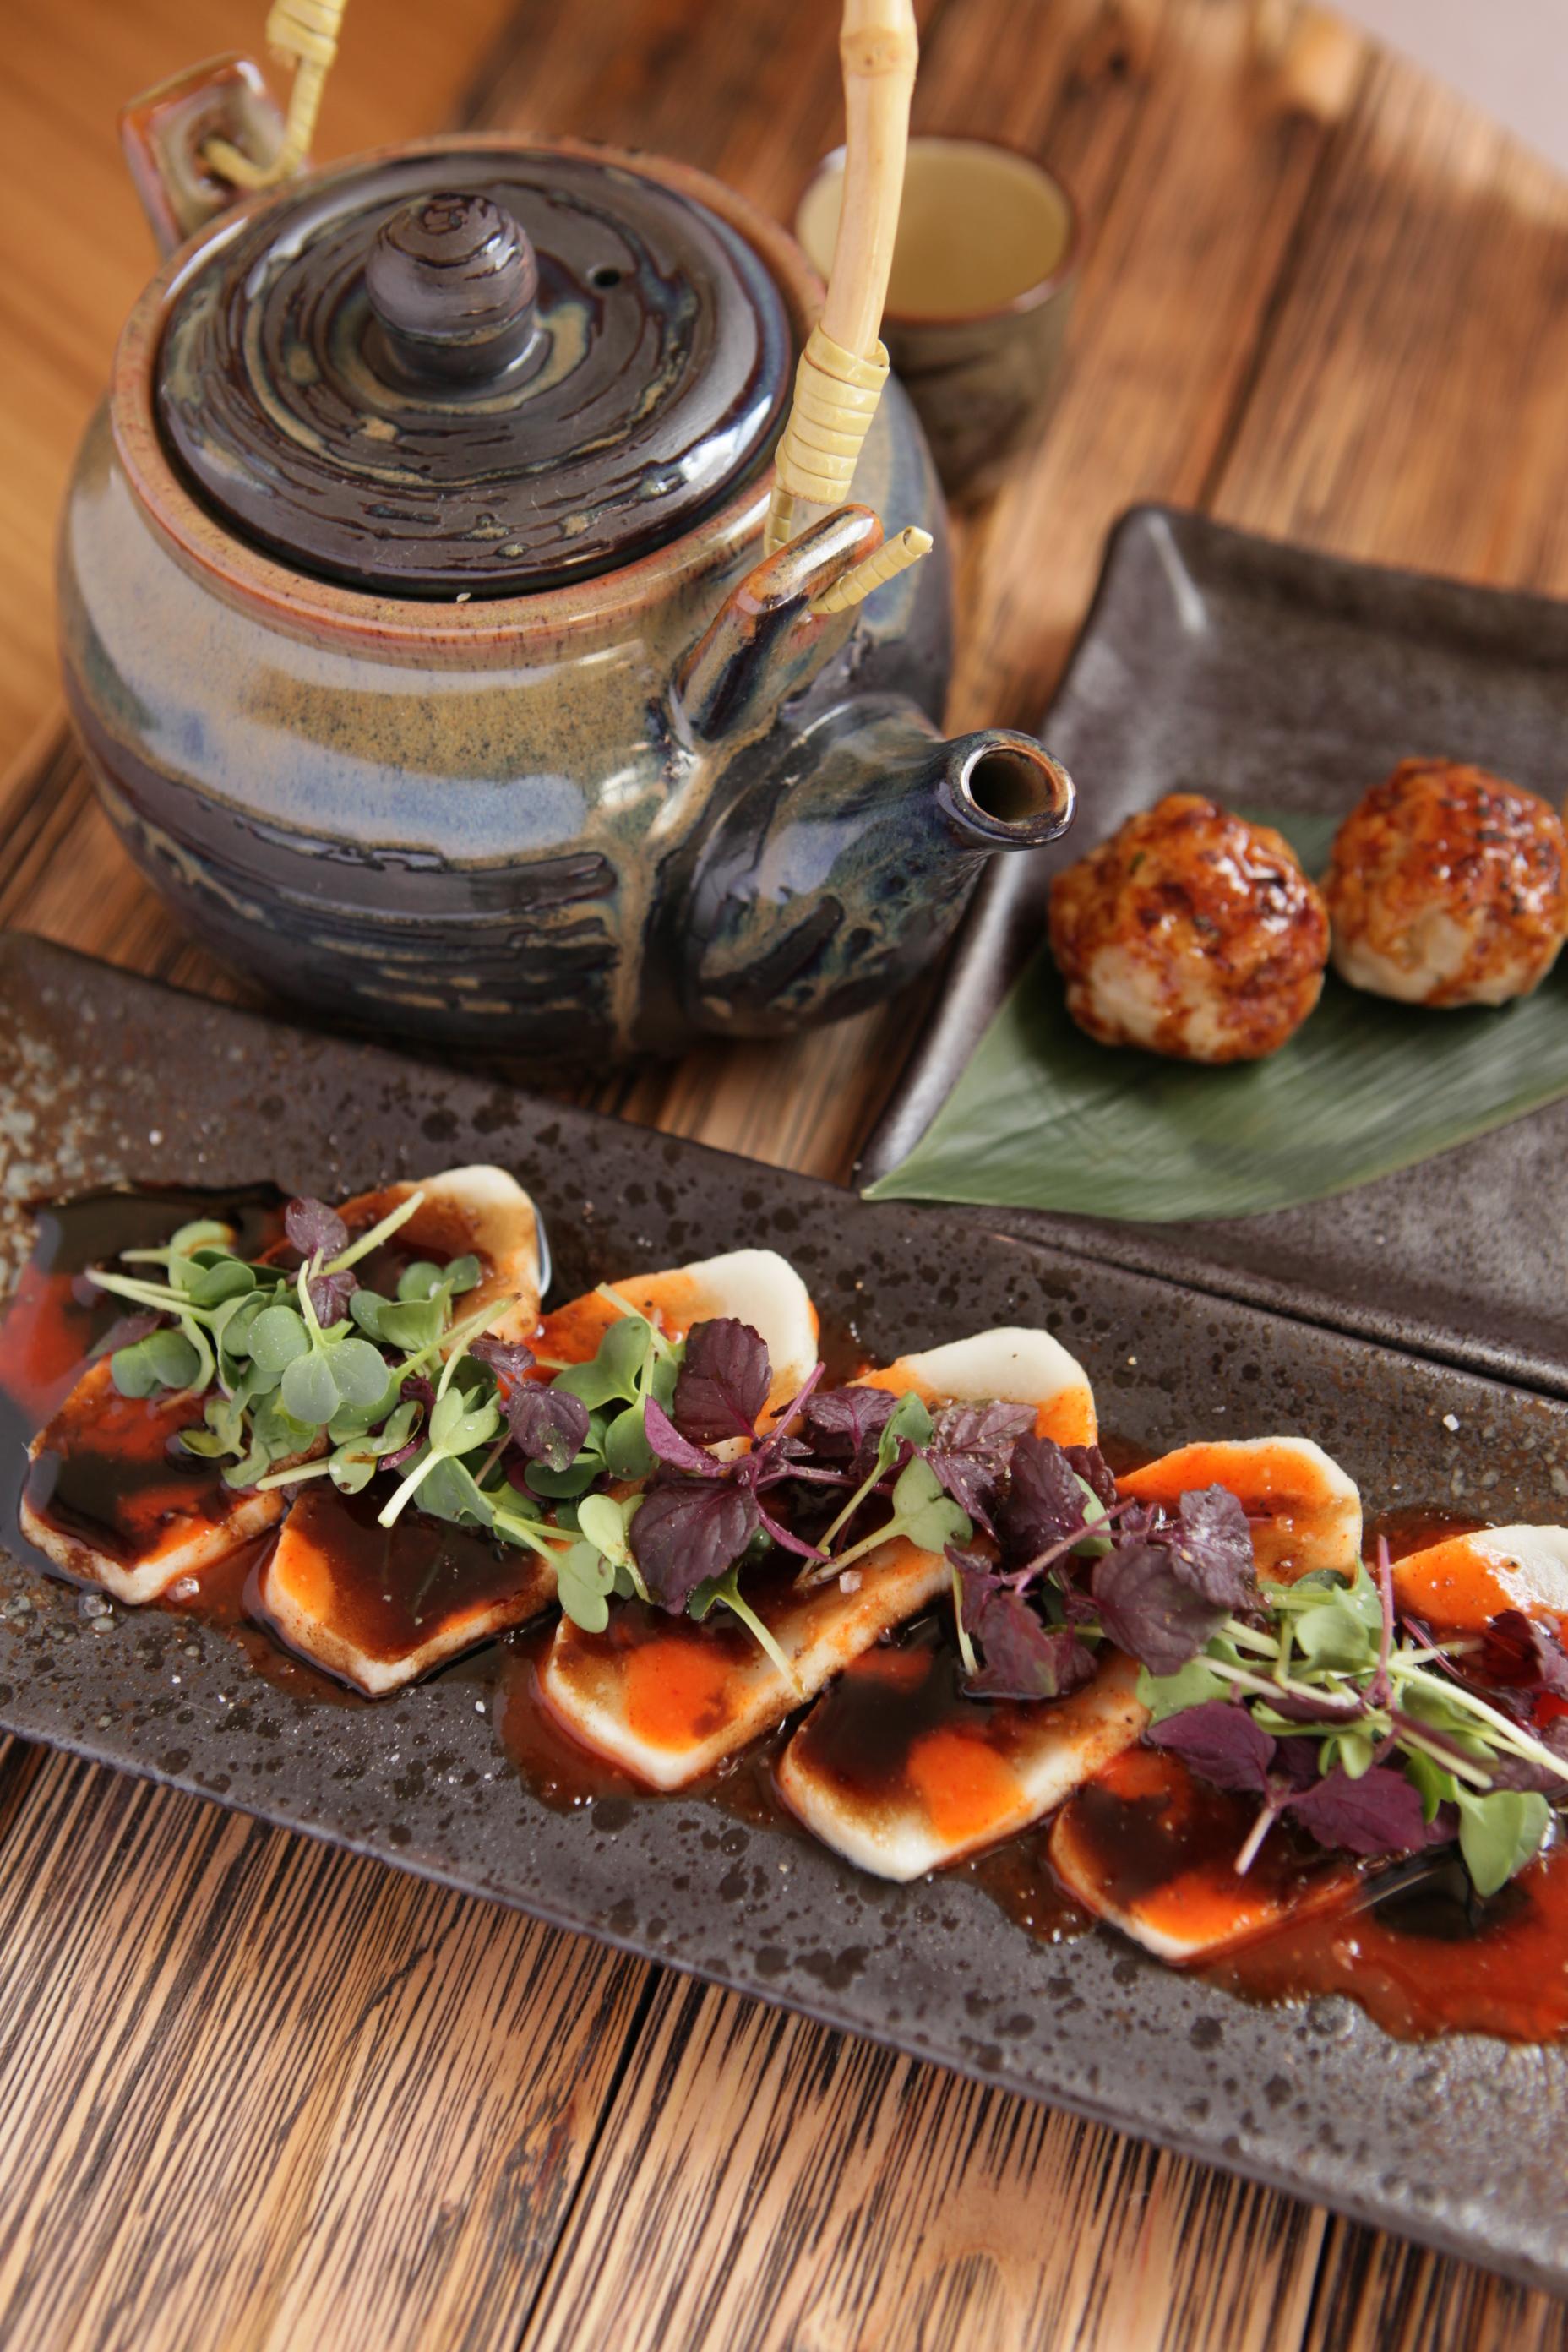 Nizuni, Charlotte Street restaurant review: Thoughtful Japanese cooking